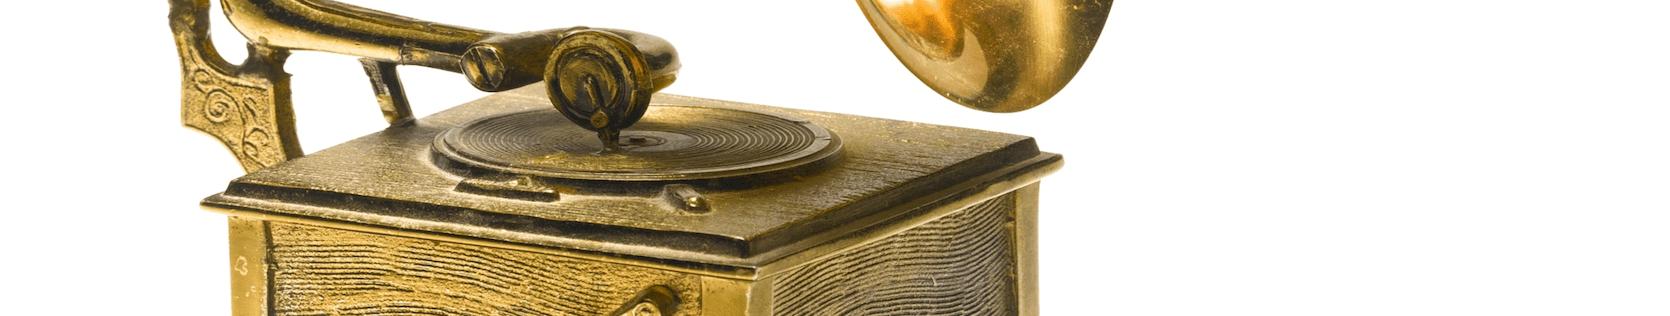 gramophone antiques